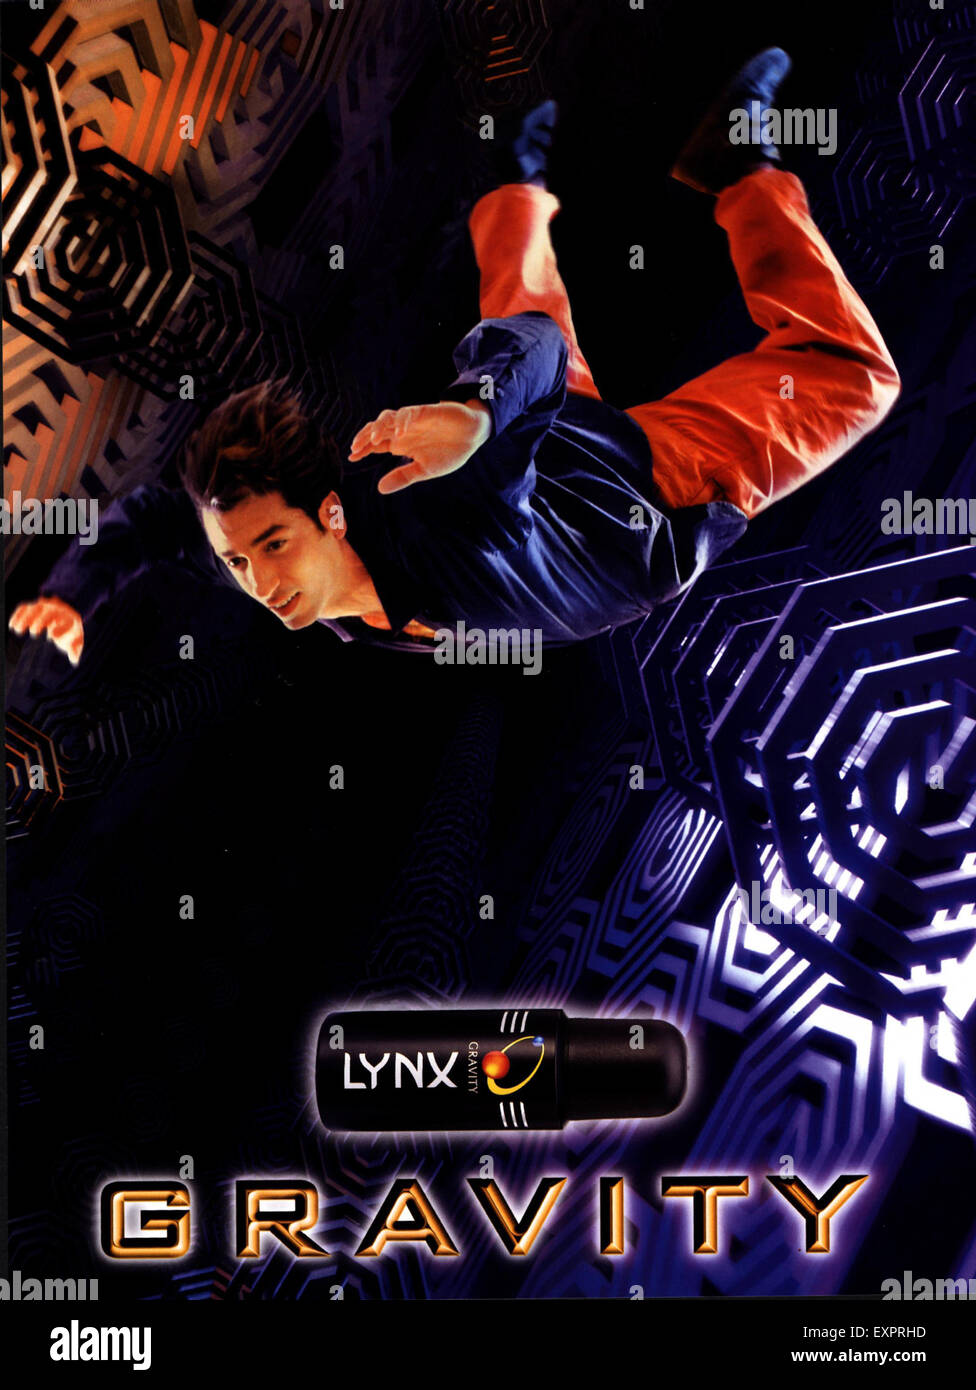 Lynx final edition advert